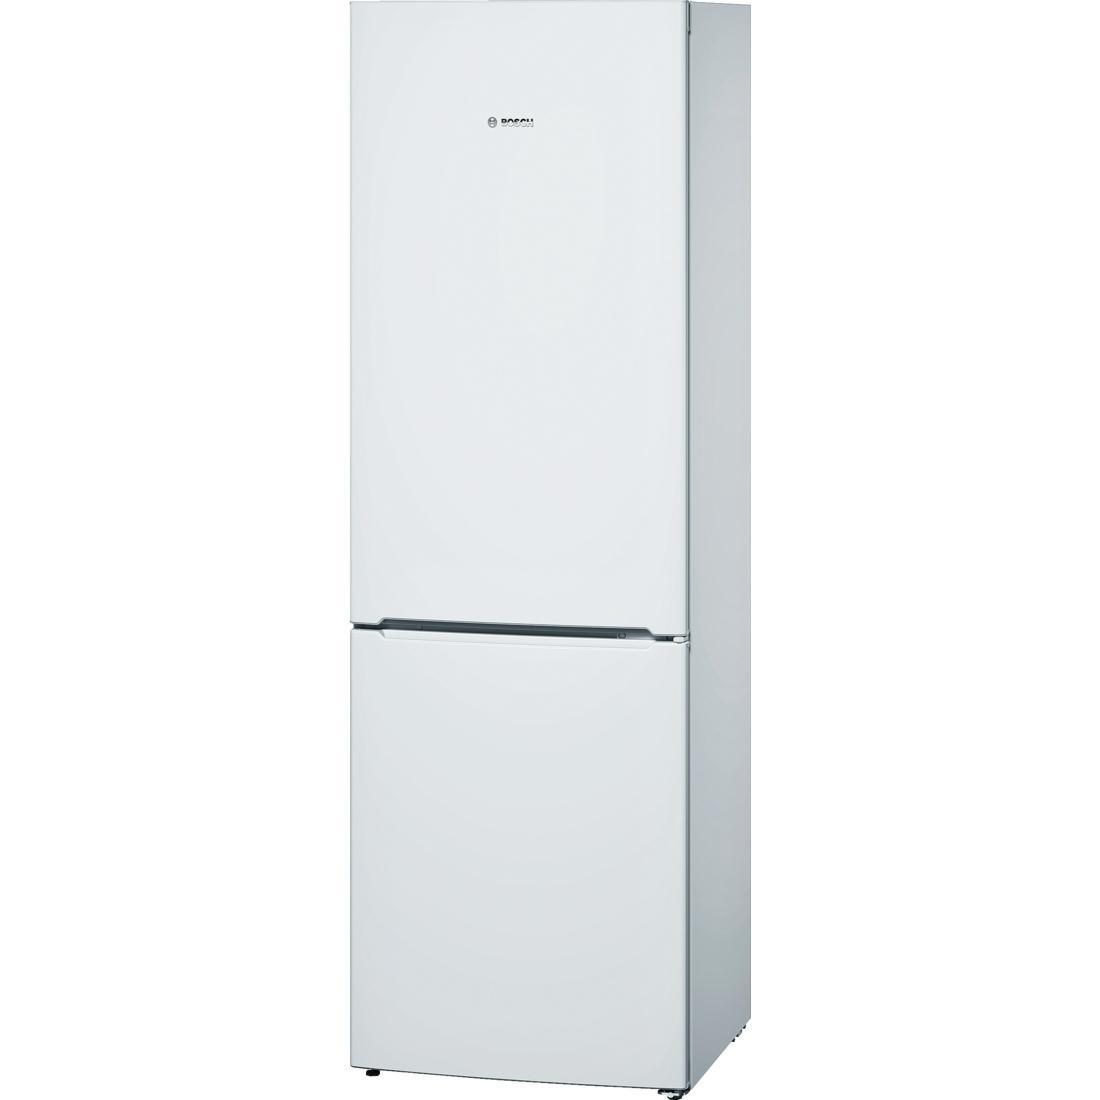 Двухкамерный холодильник Bosch KGV36VW23E